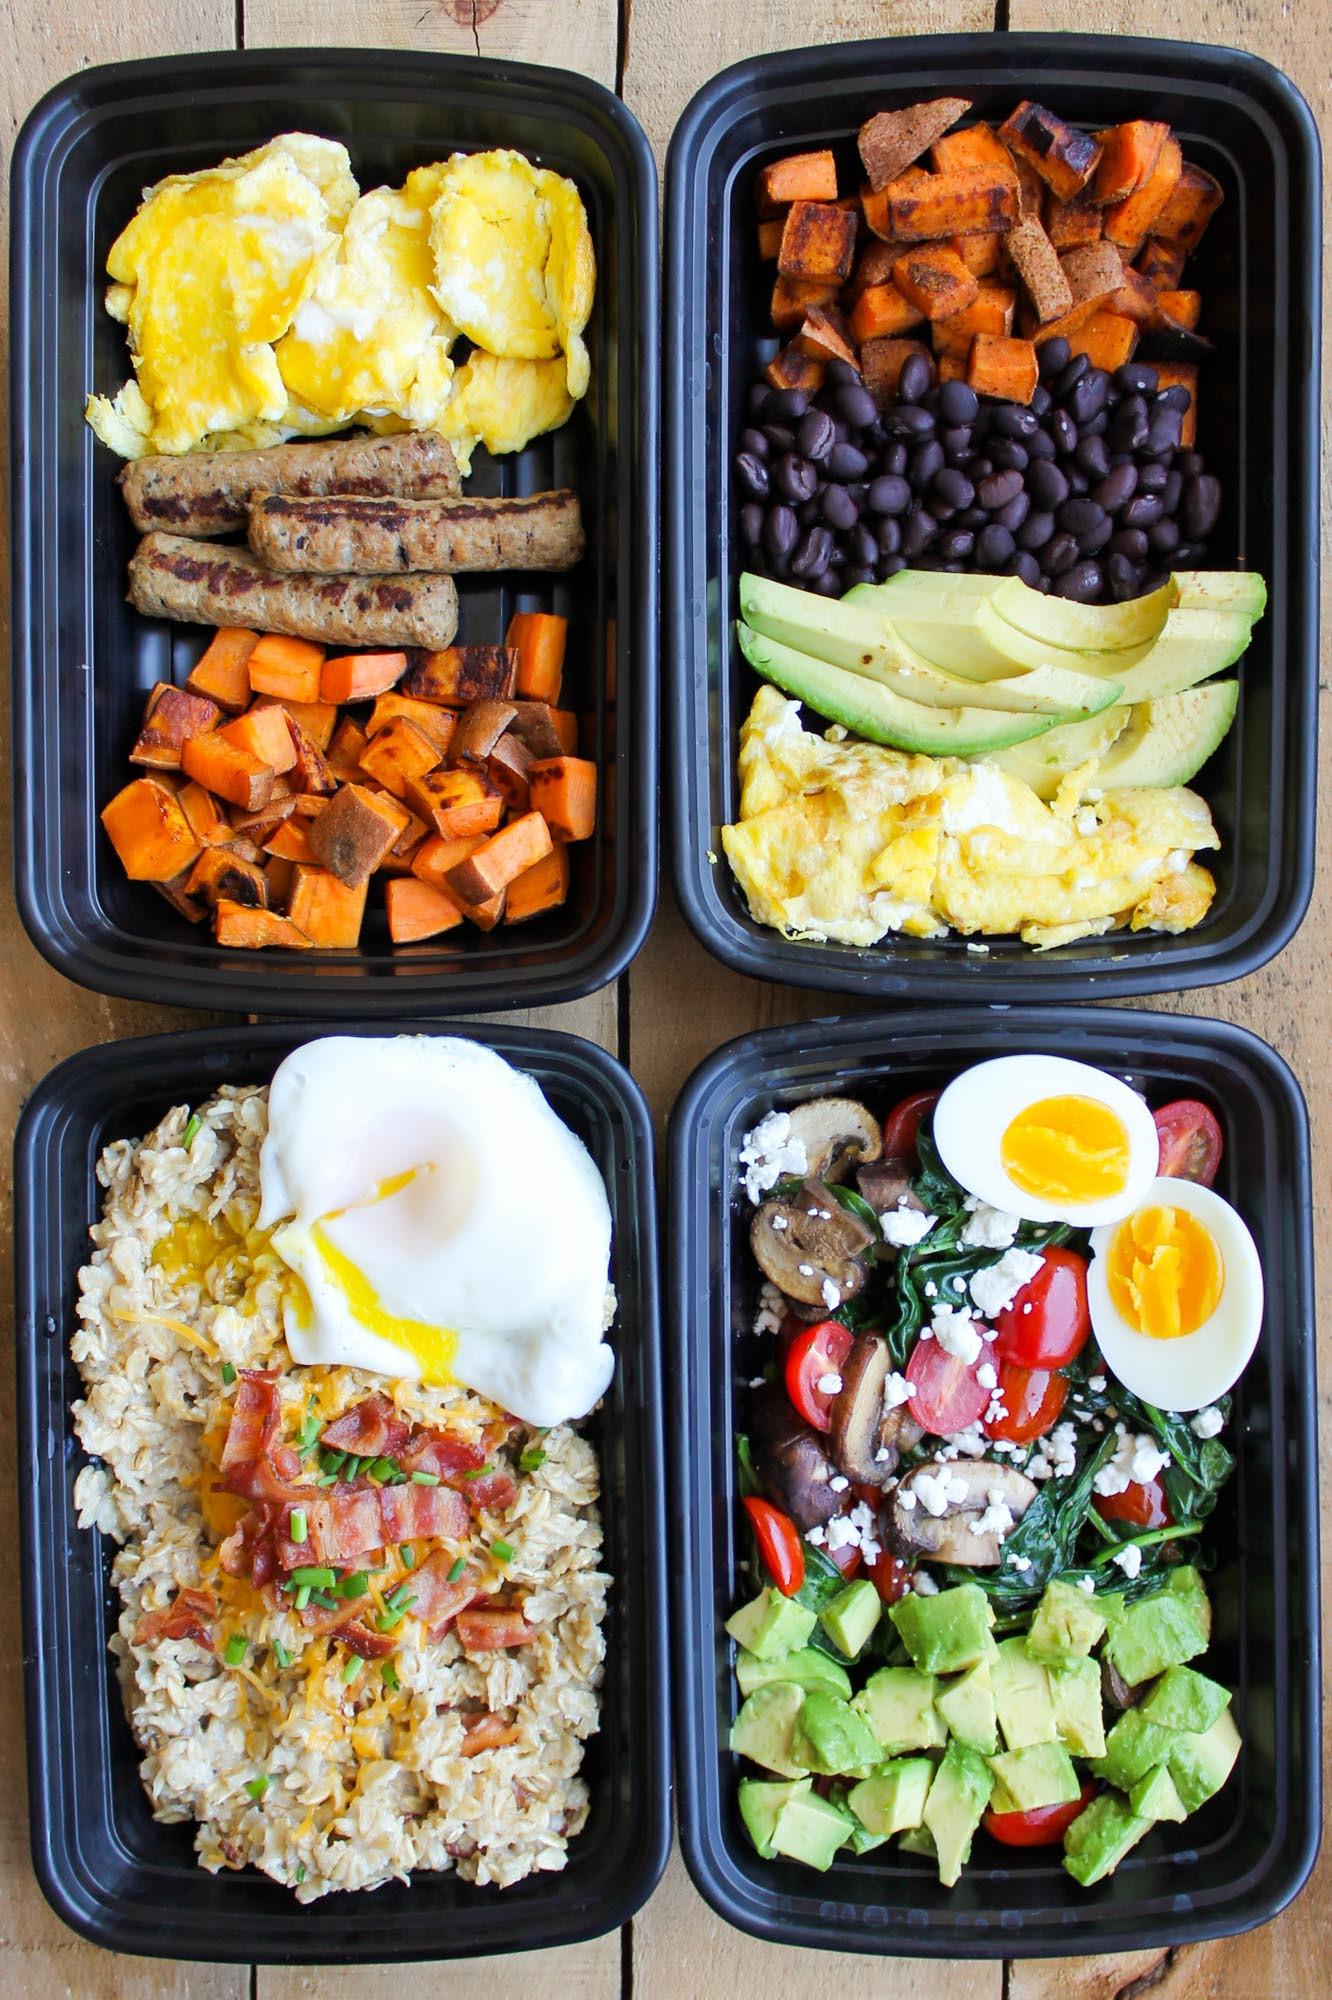 Healthy Breakfast Meal Prep Ideas  Make Ahead Breakfast Meal Prep Bowls 4 Ways Smile Sandwich